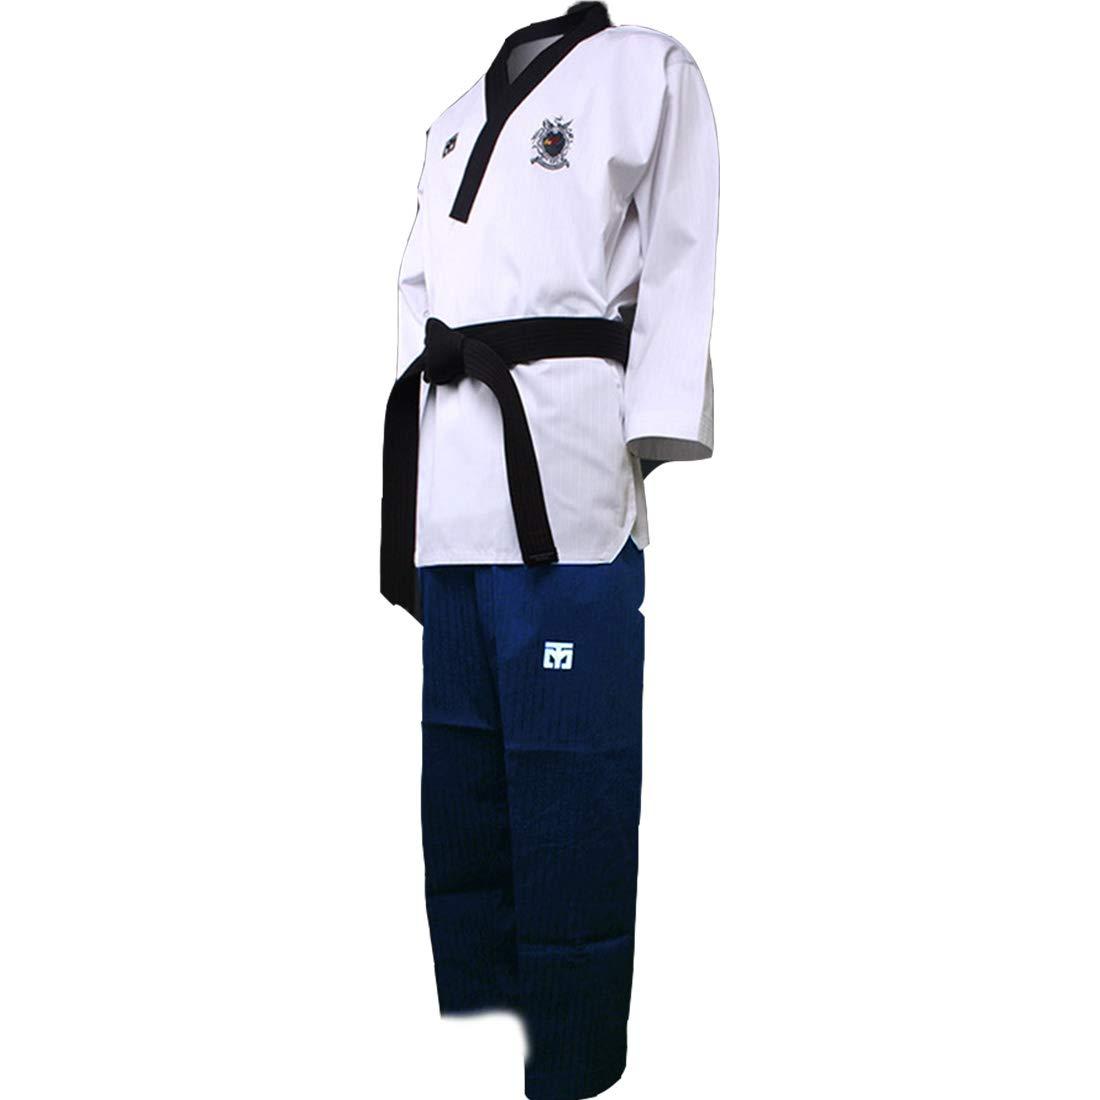 Mooto WTF Poomsae Uniform Korea Taekwondo female Dan Dobok (200(US6)(6.23~6.56ft or 190-200cm)) by Mooto